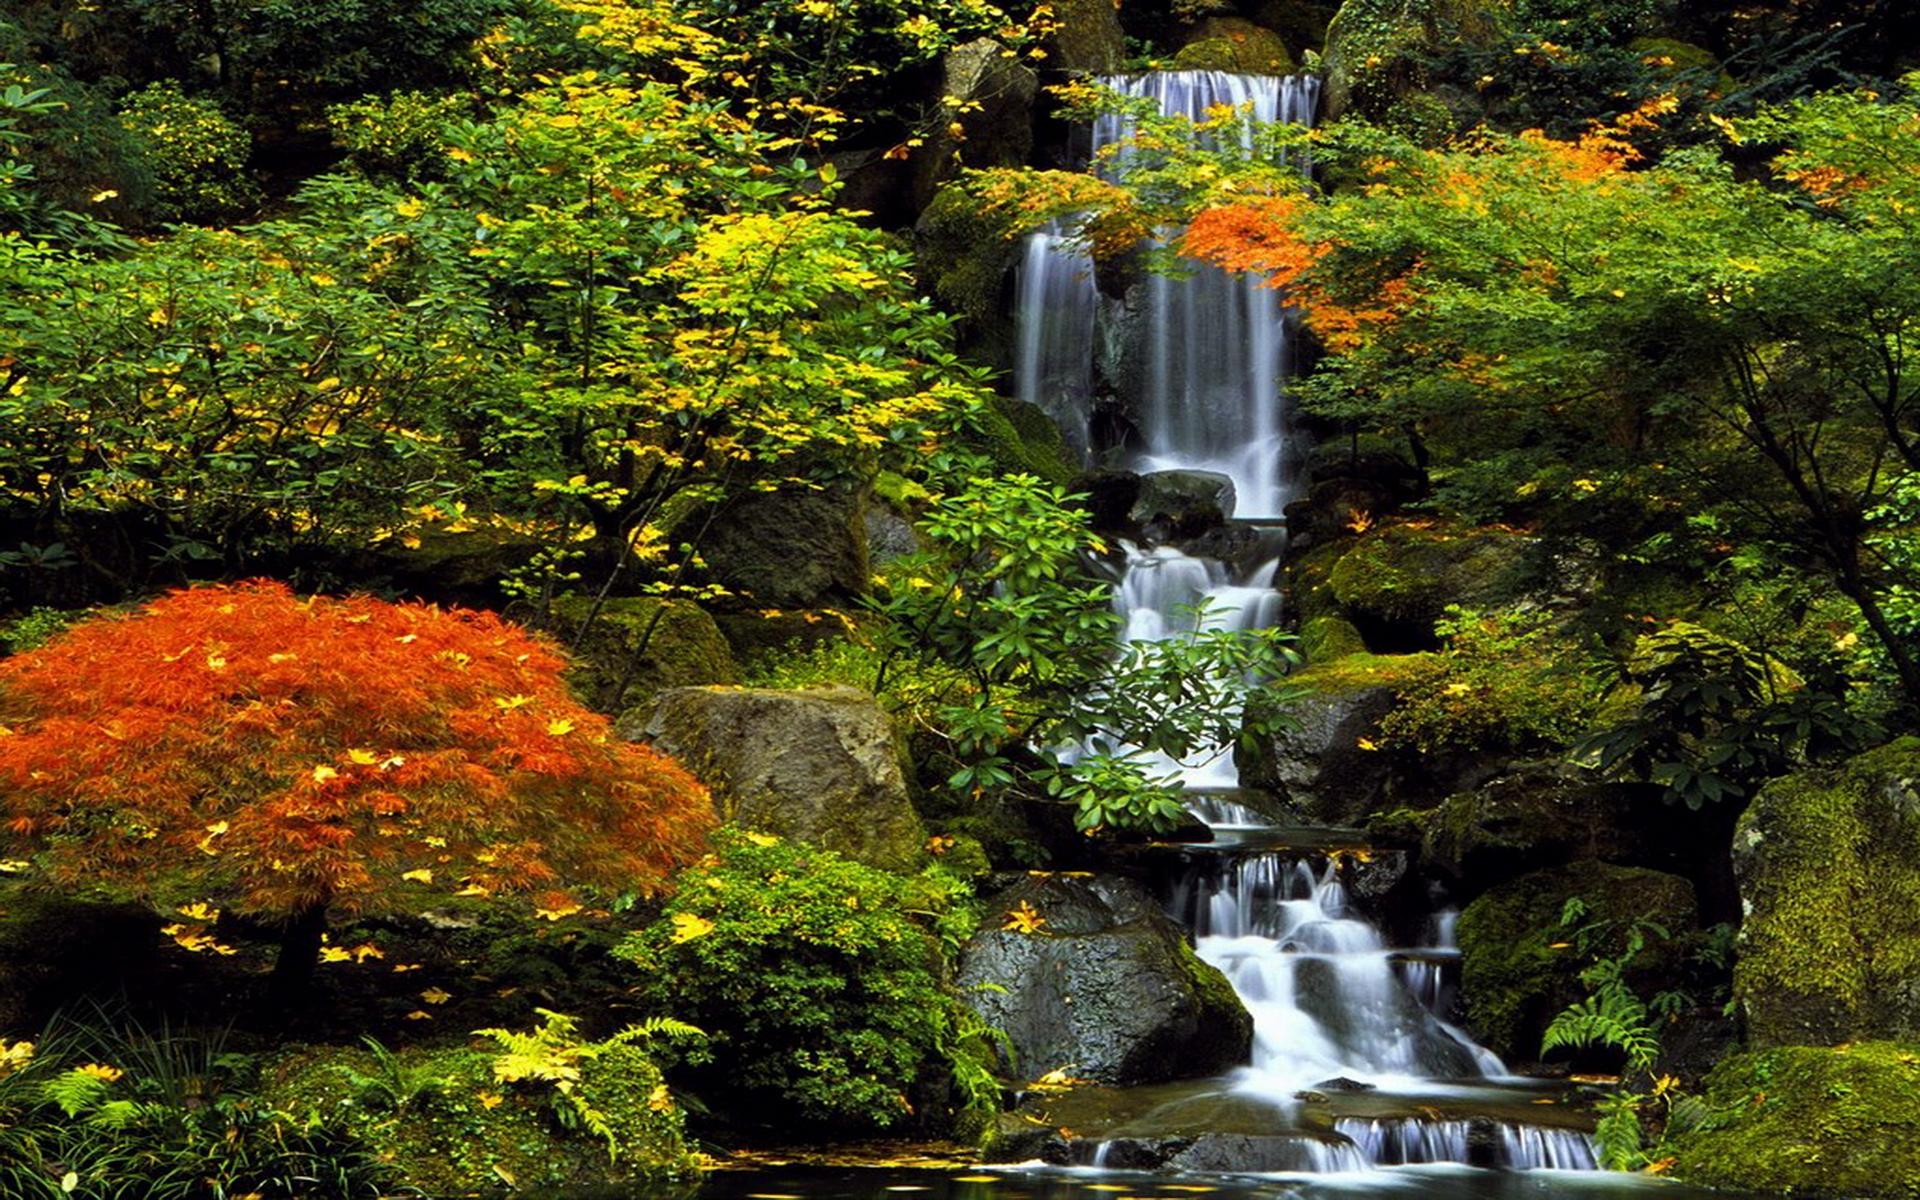 comJapanJapanese Garden Wallpapersimagepagesimage9htm 1920x1200